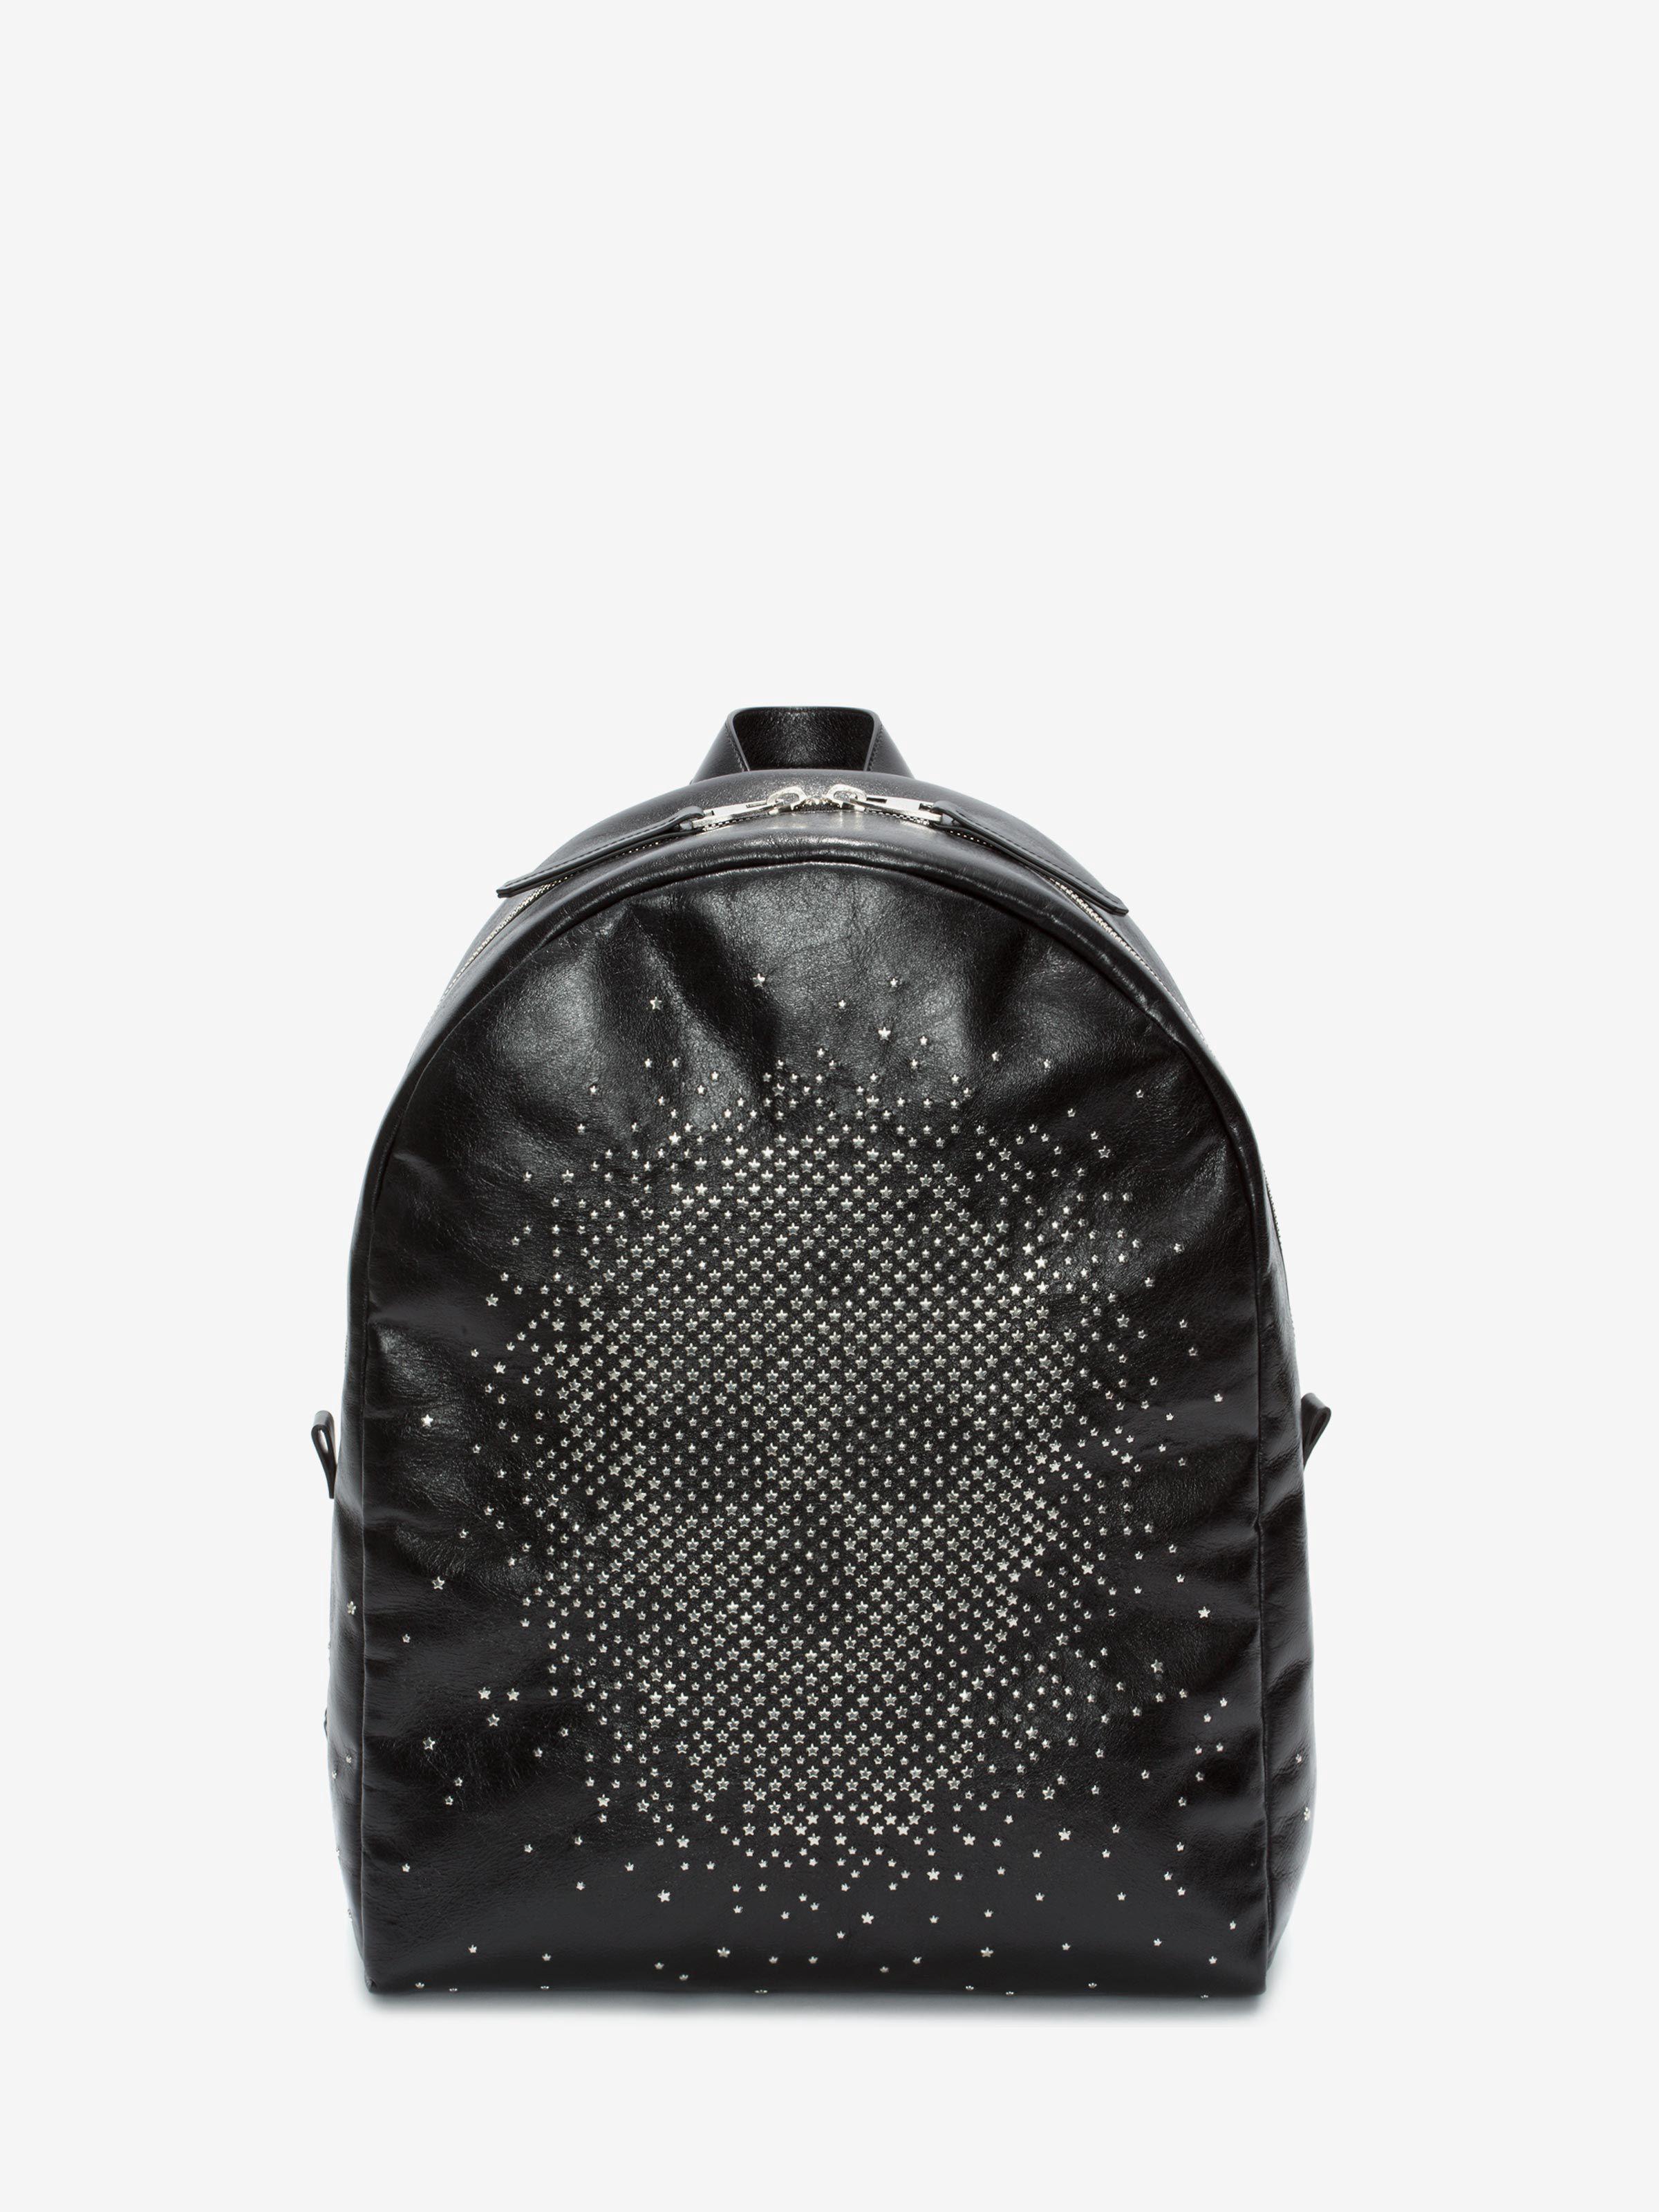 Alexander Mcqueen Leathers Exploded Studded Skull Backpack